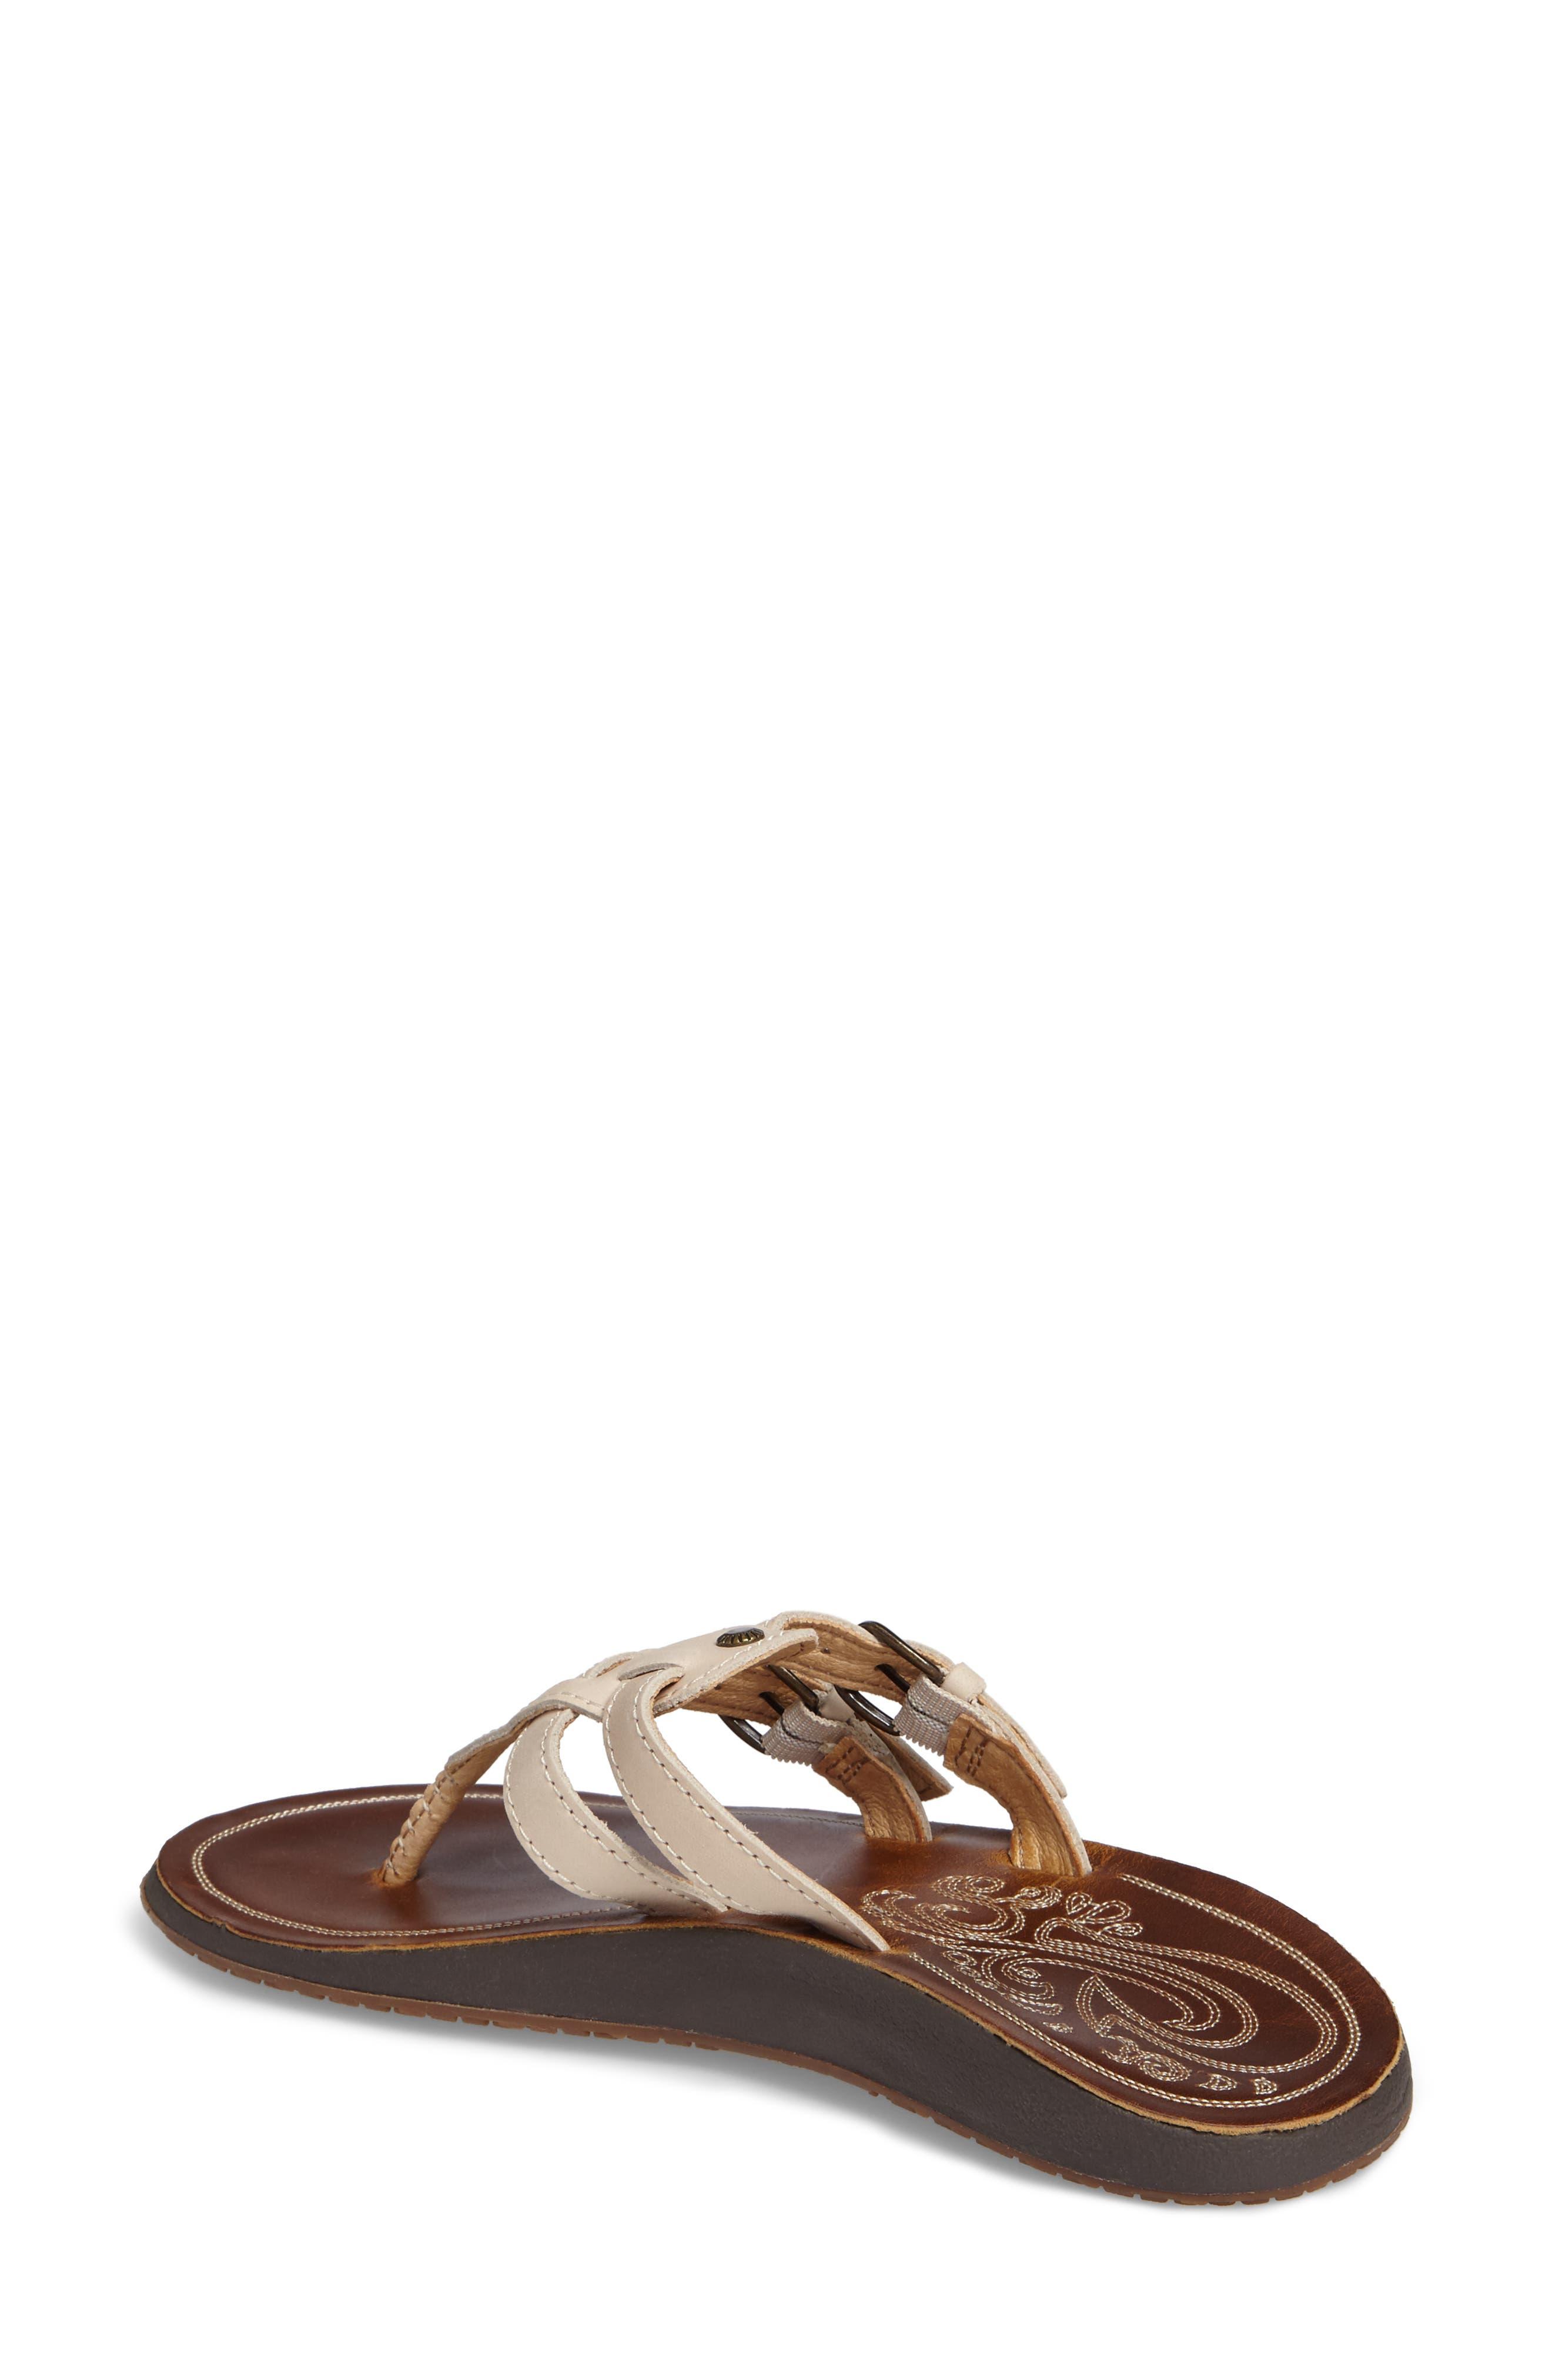 Honoka'a Buckle Flip Flop,                             Alternate thumbnail 2, color,                             Tapa/ Sahara Leather